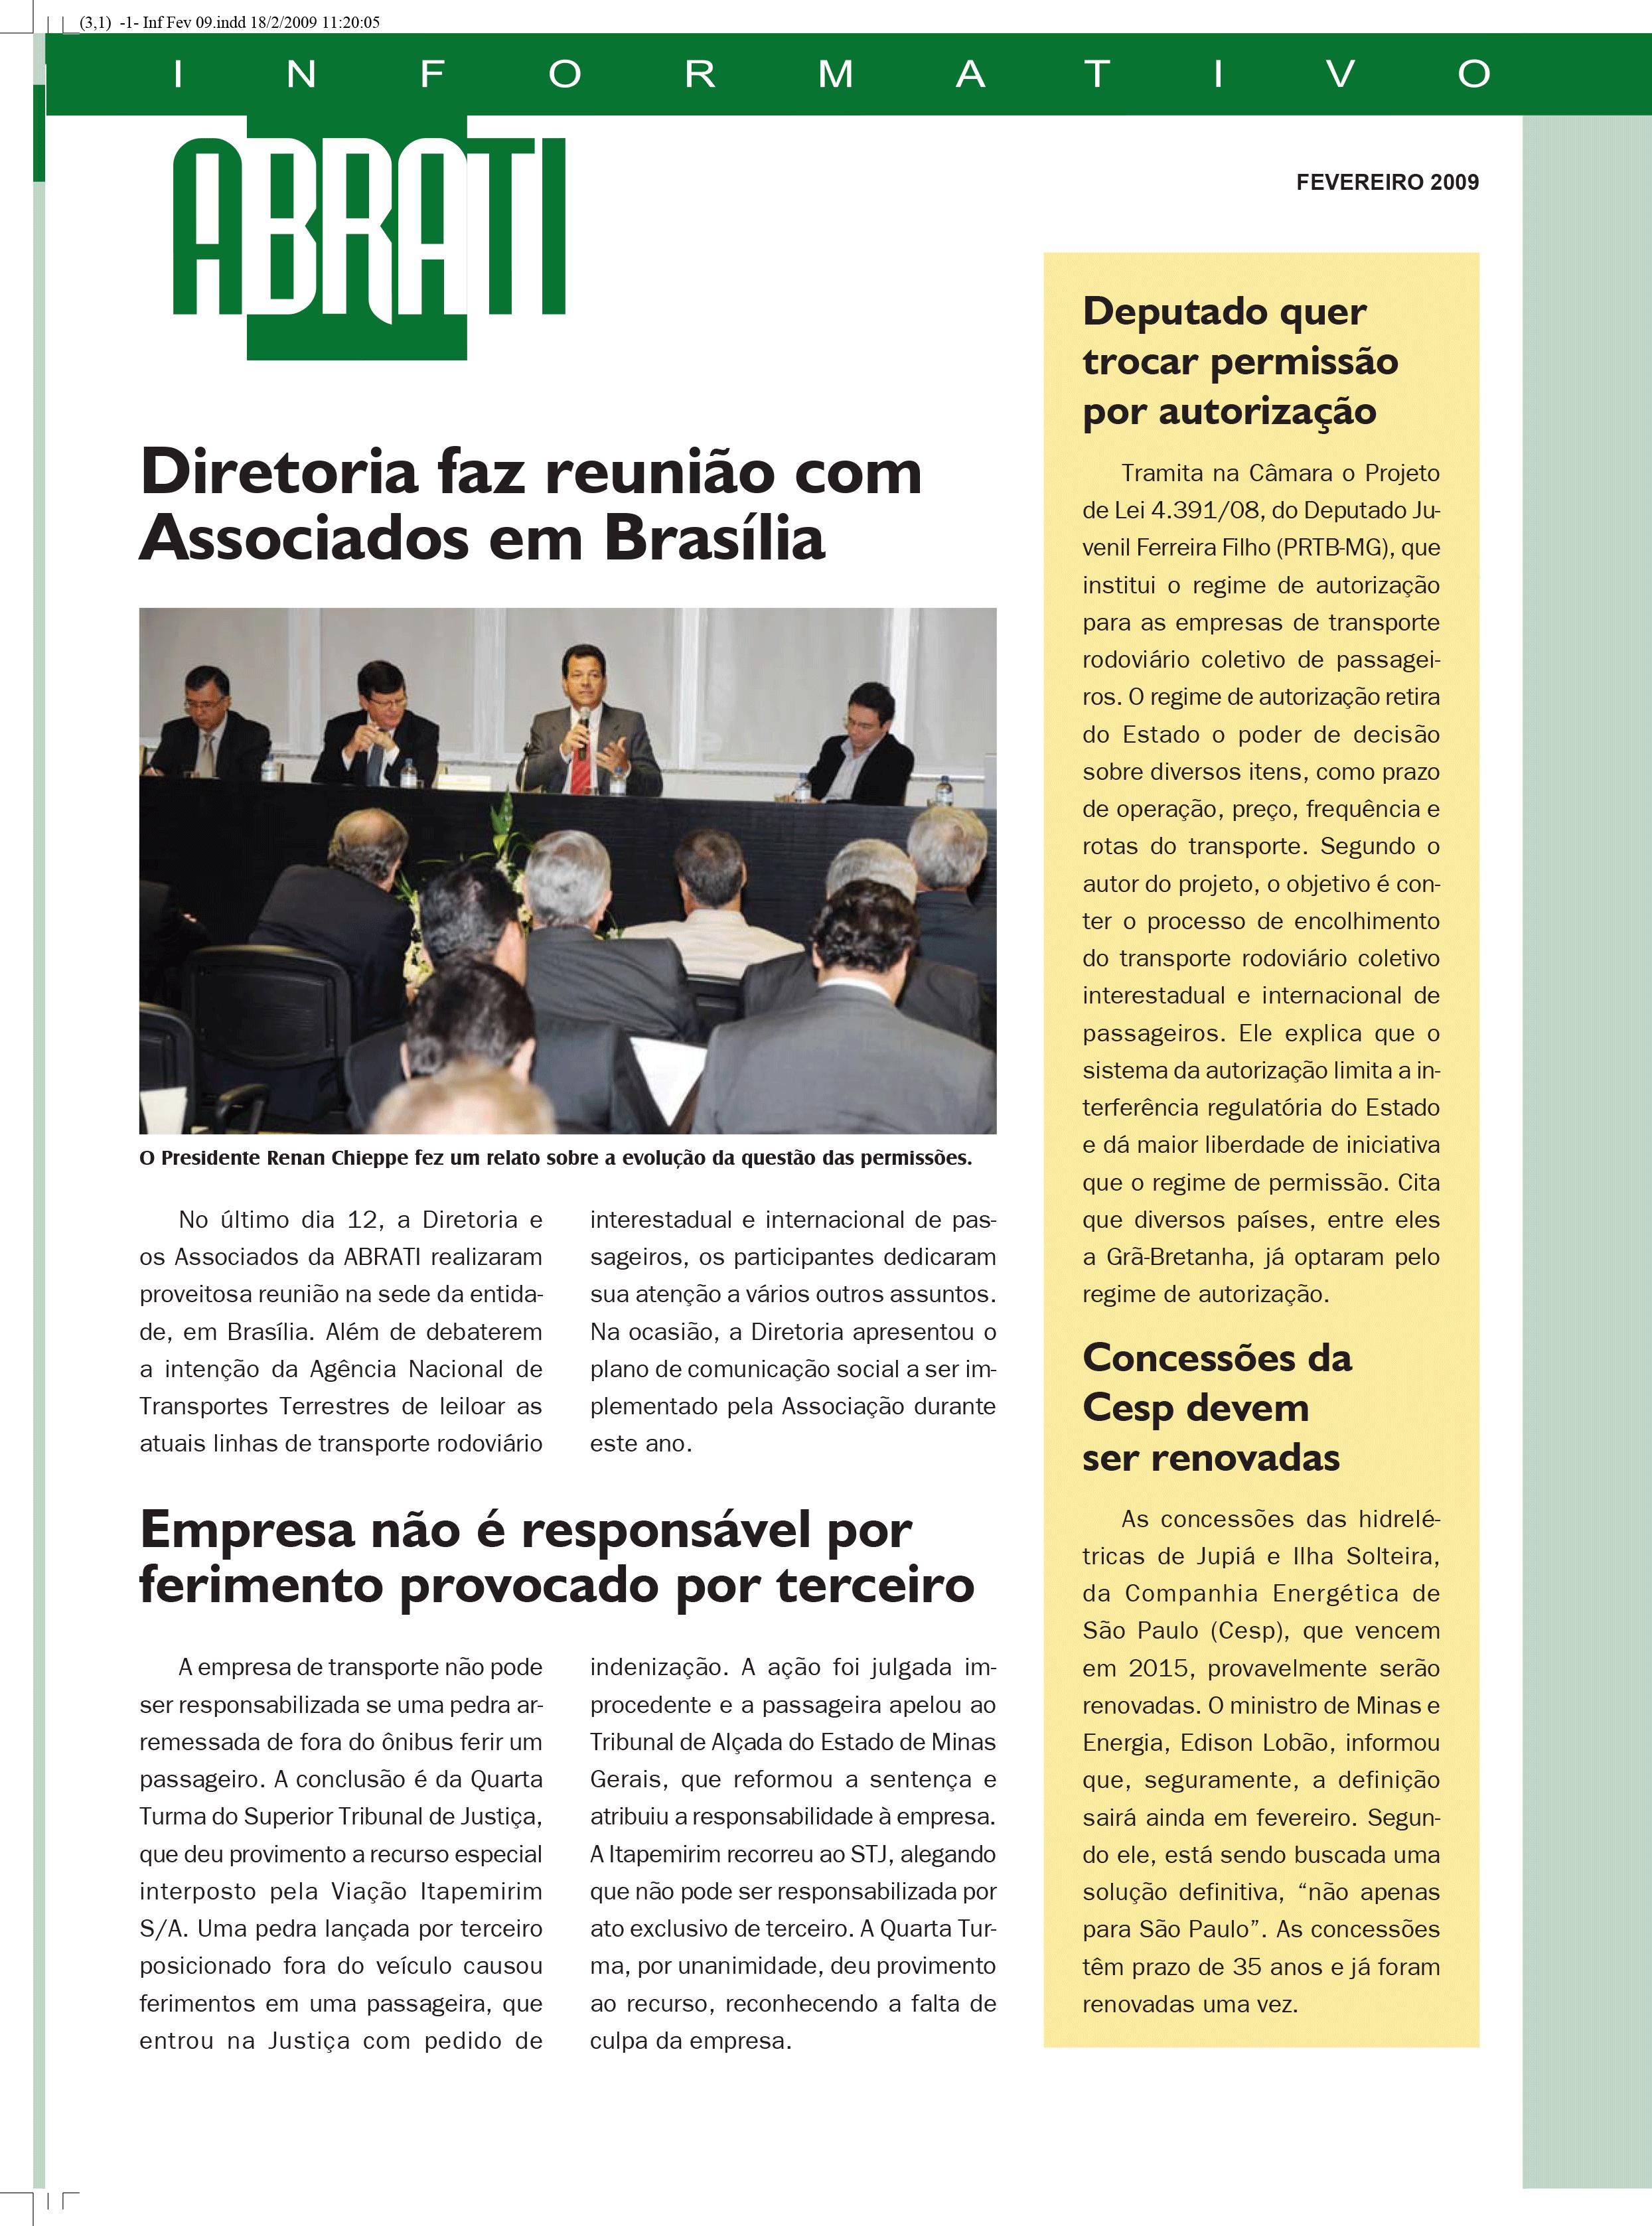 Informativo Fevereiro 2009